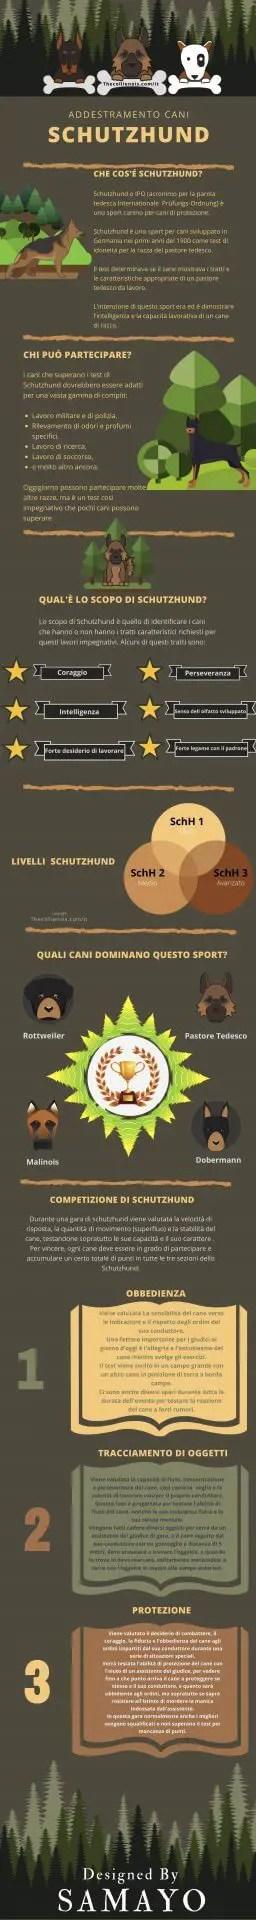 Addestramento cani Schutzhund infografica 2019